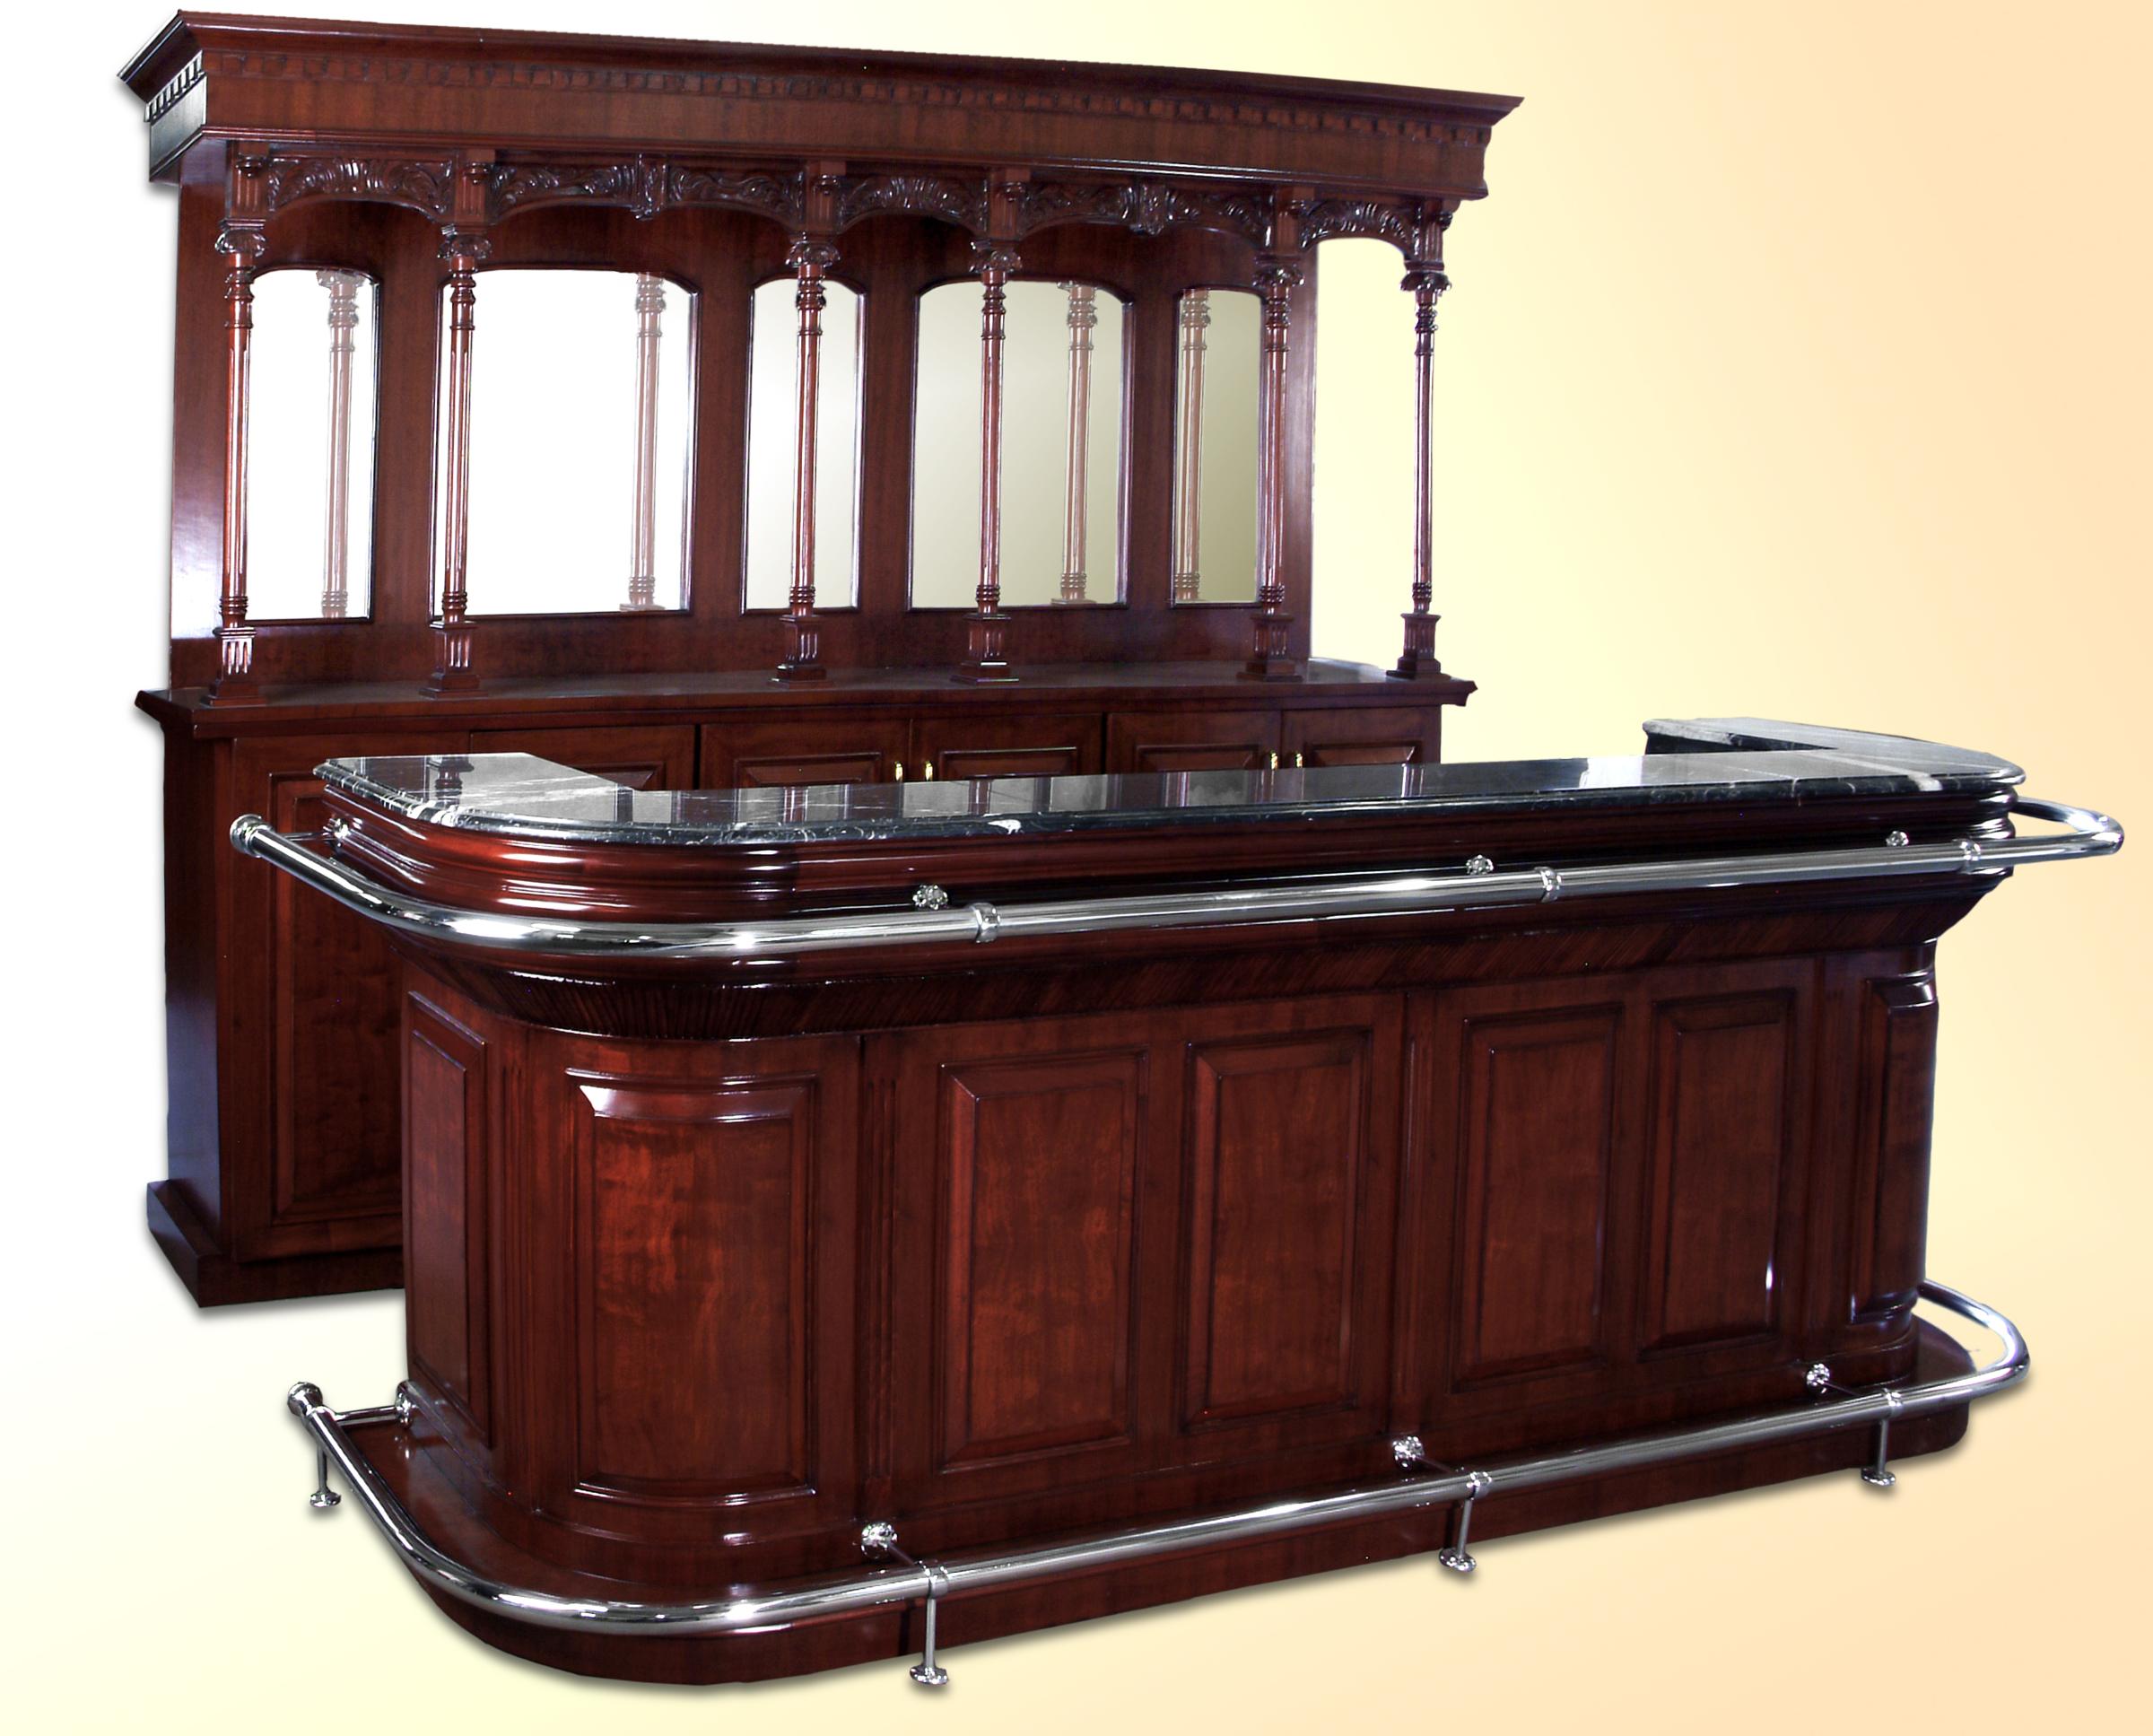 Bar 129MA – 9 ft Maple with Mahogany Finish Cocktail Bar